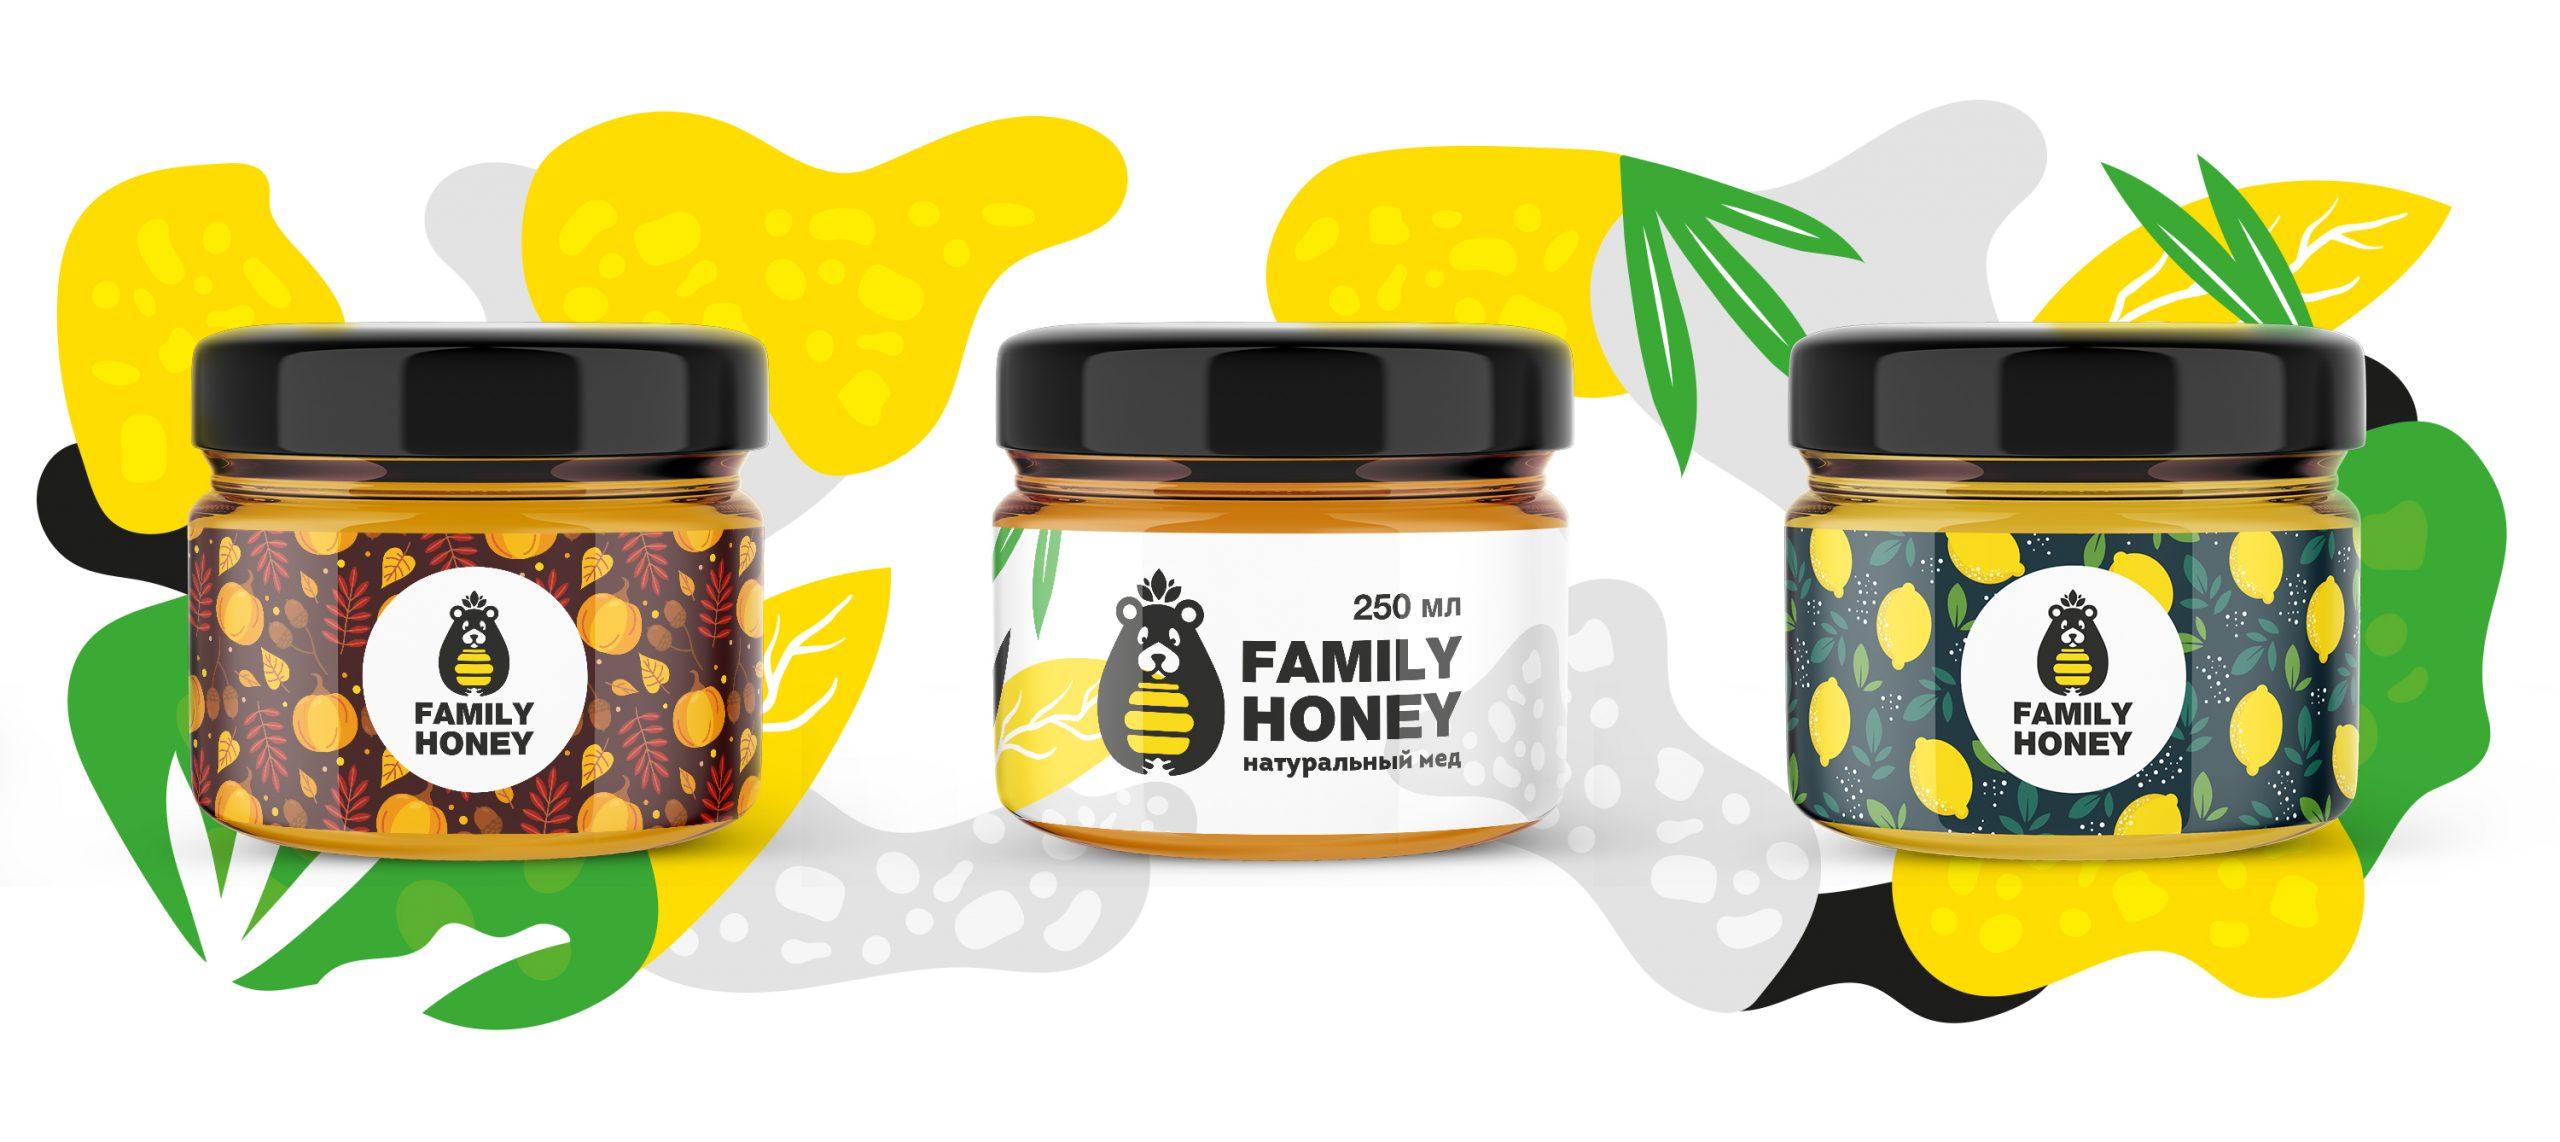 Family Honey logotype